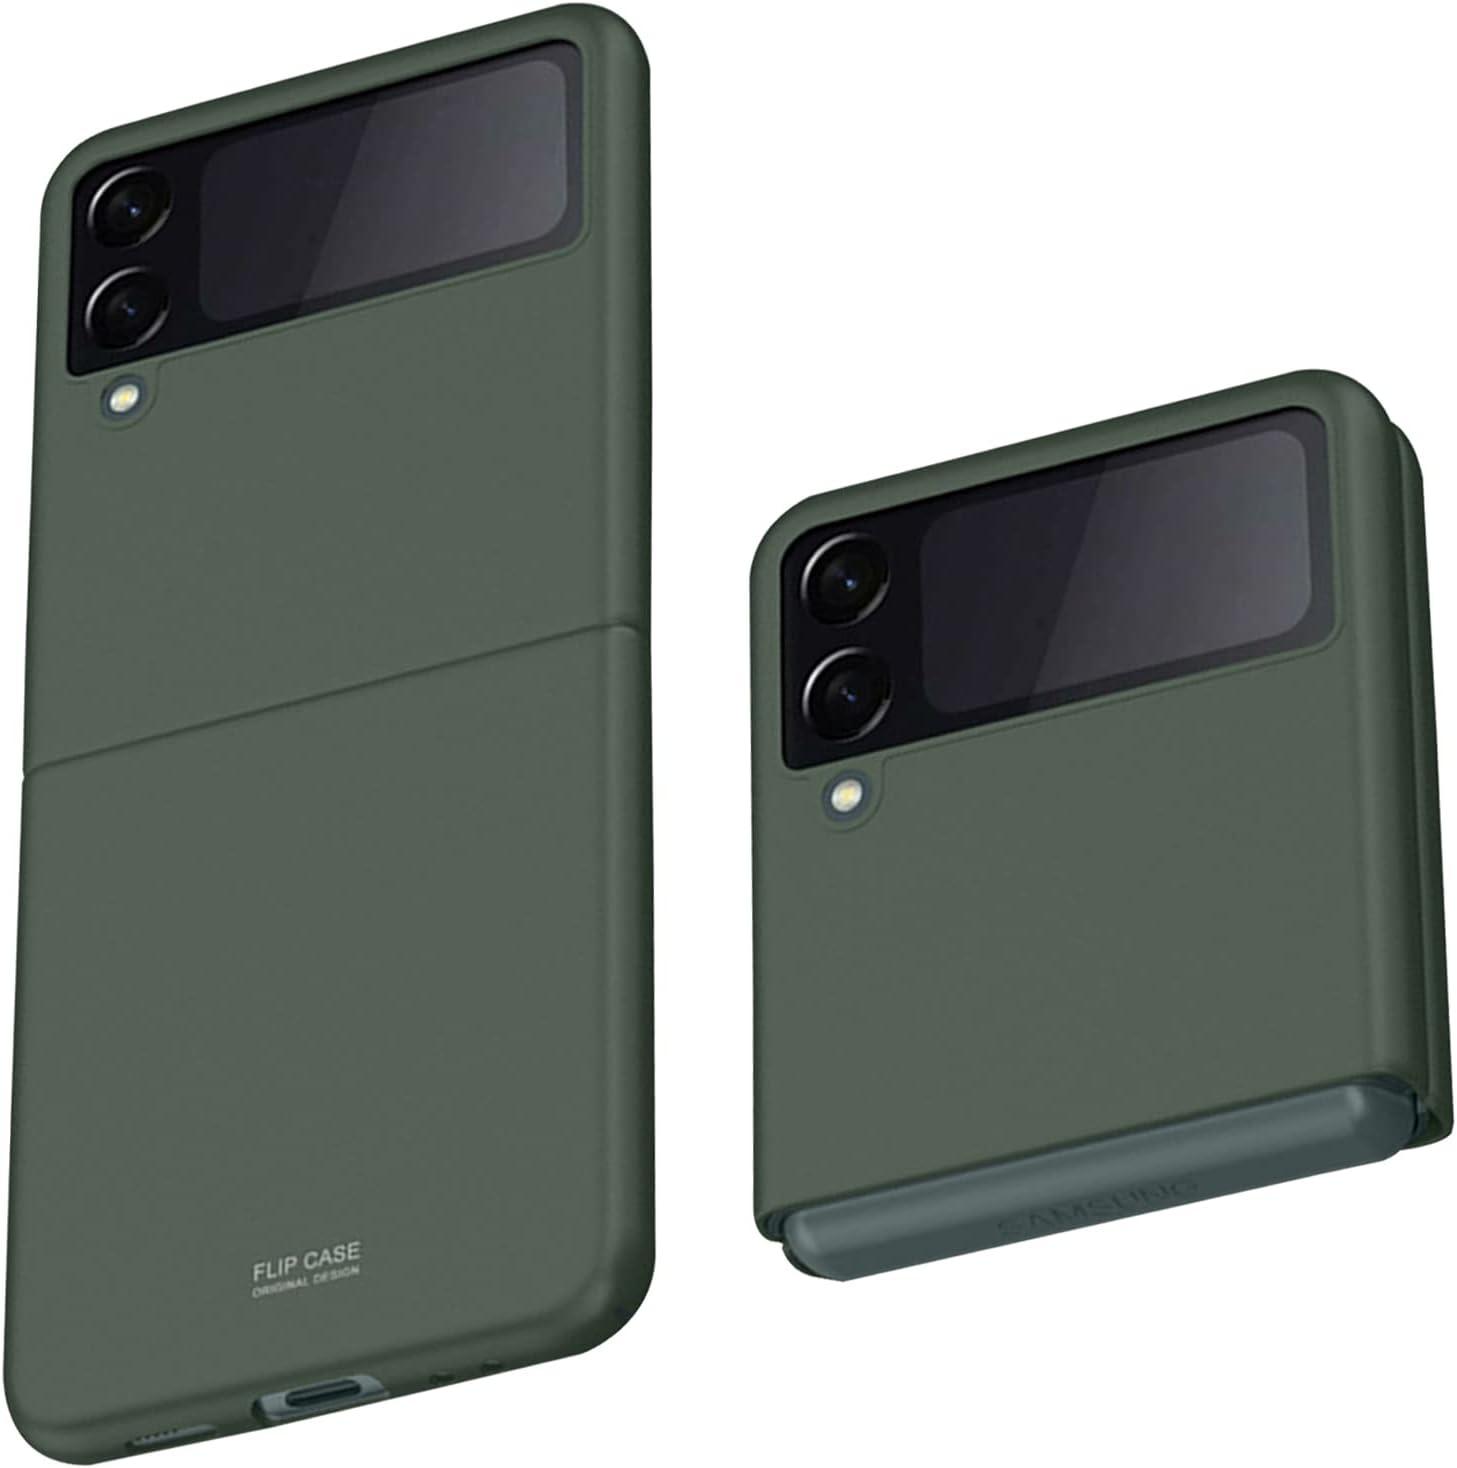 Z Flip 3 Case, Slim fit Samsung z flip 3 case 5G Phone Case Full Protection Cover Hard PC Shockproof Durable Protective Phone Cover for Z Flip3 5G (Green)